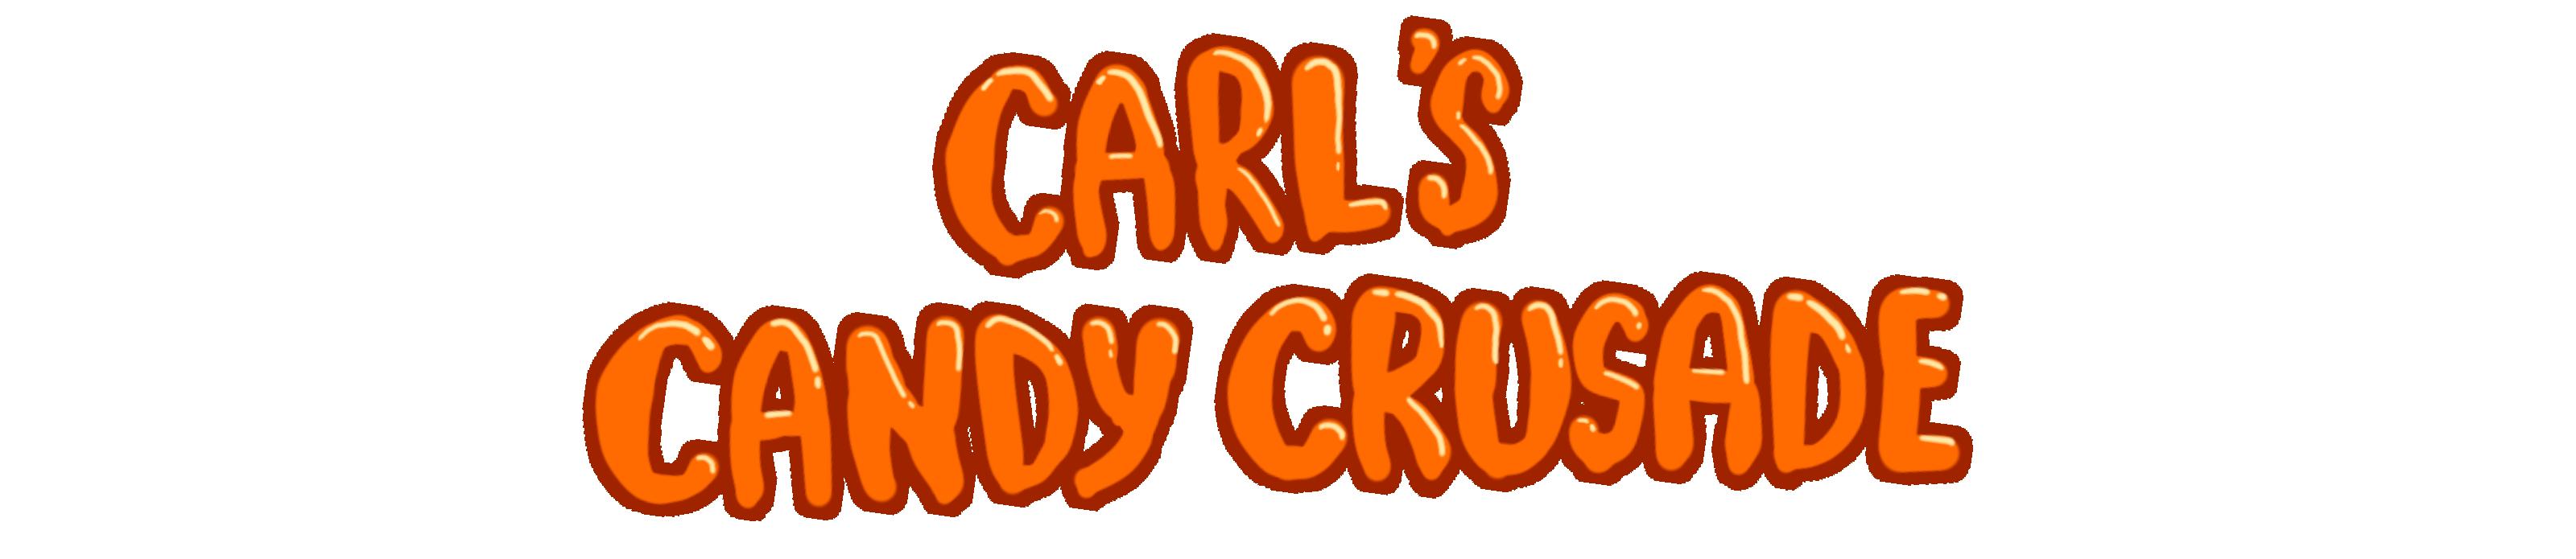 Carl's Candy Crusade